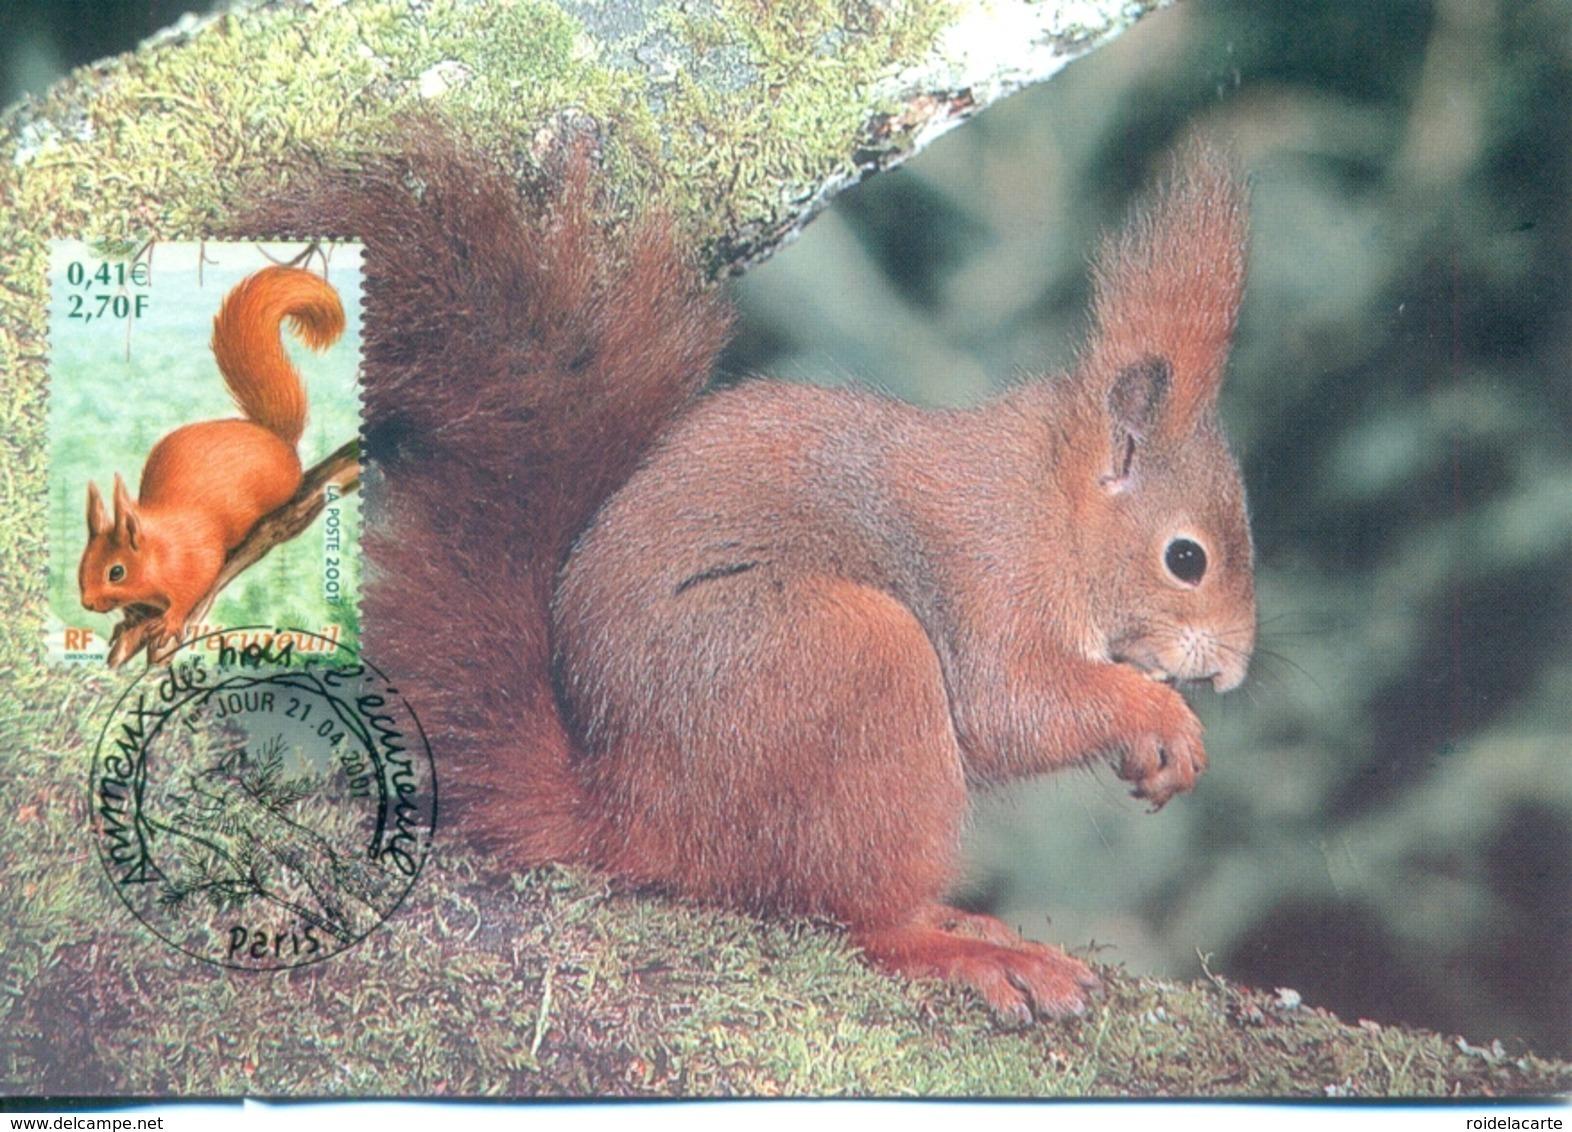 CM-Carte Maximum Card # 2001 - France # Animaux,animals #Rongeur,rodent,Nagetier # Écureuil,Squirrel,Eichhörnchen - Nager